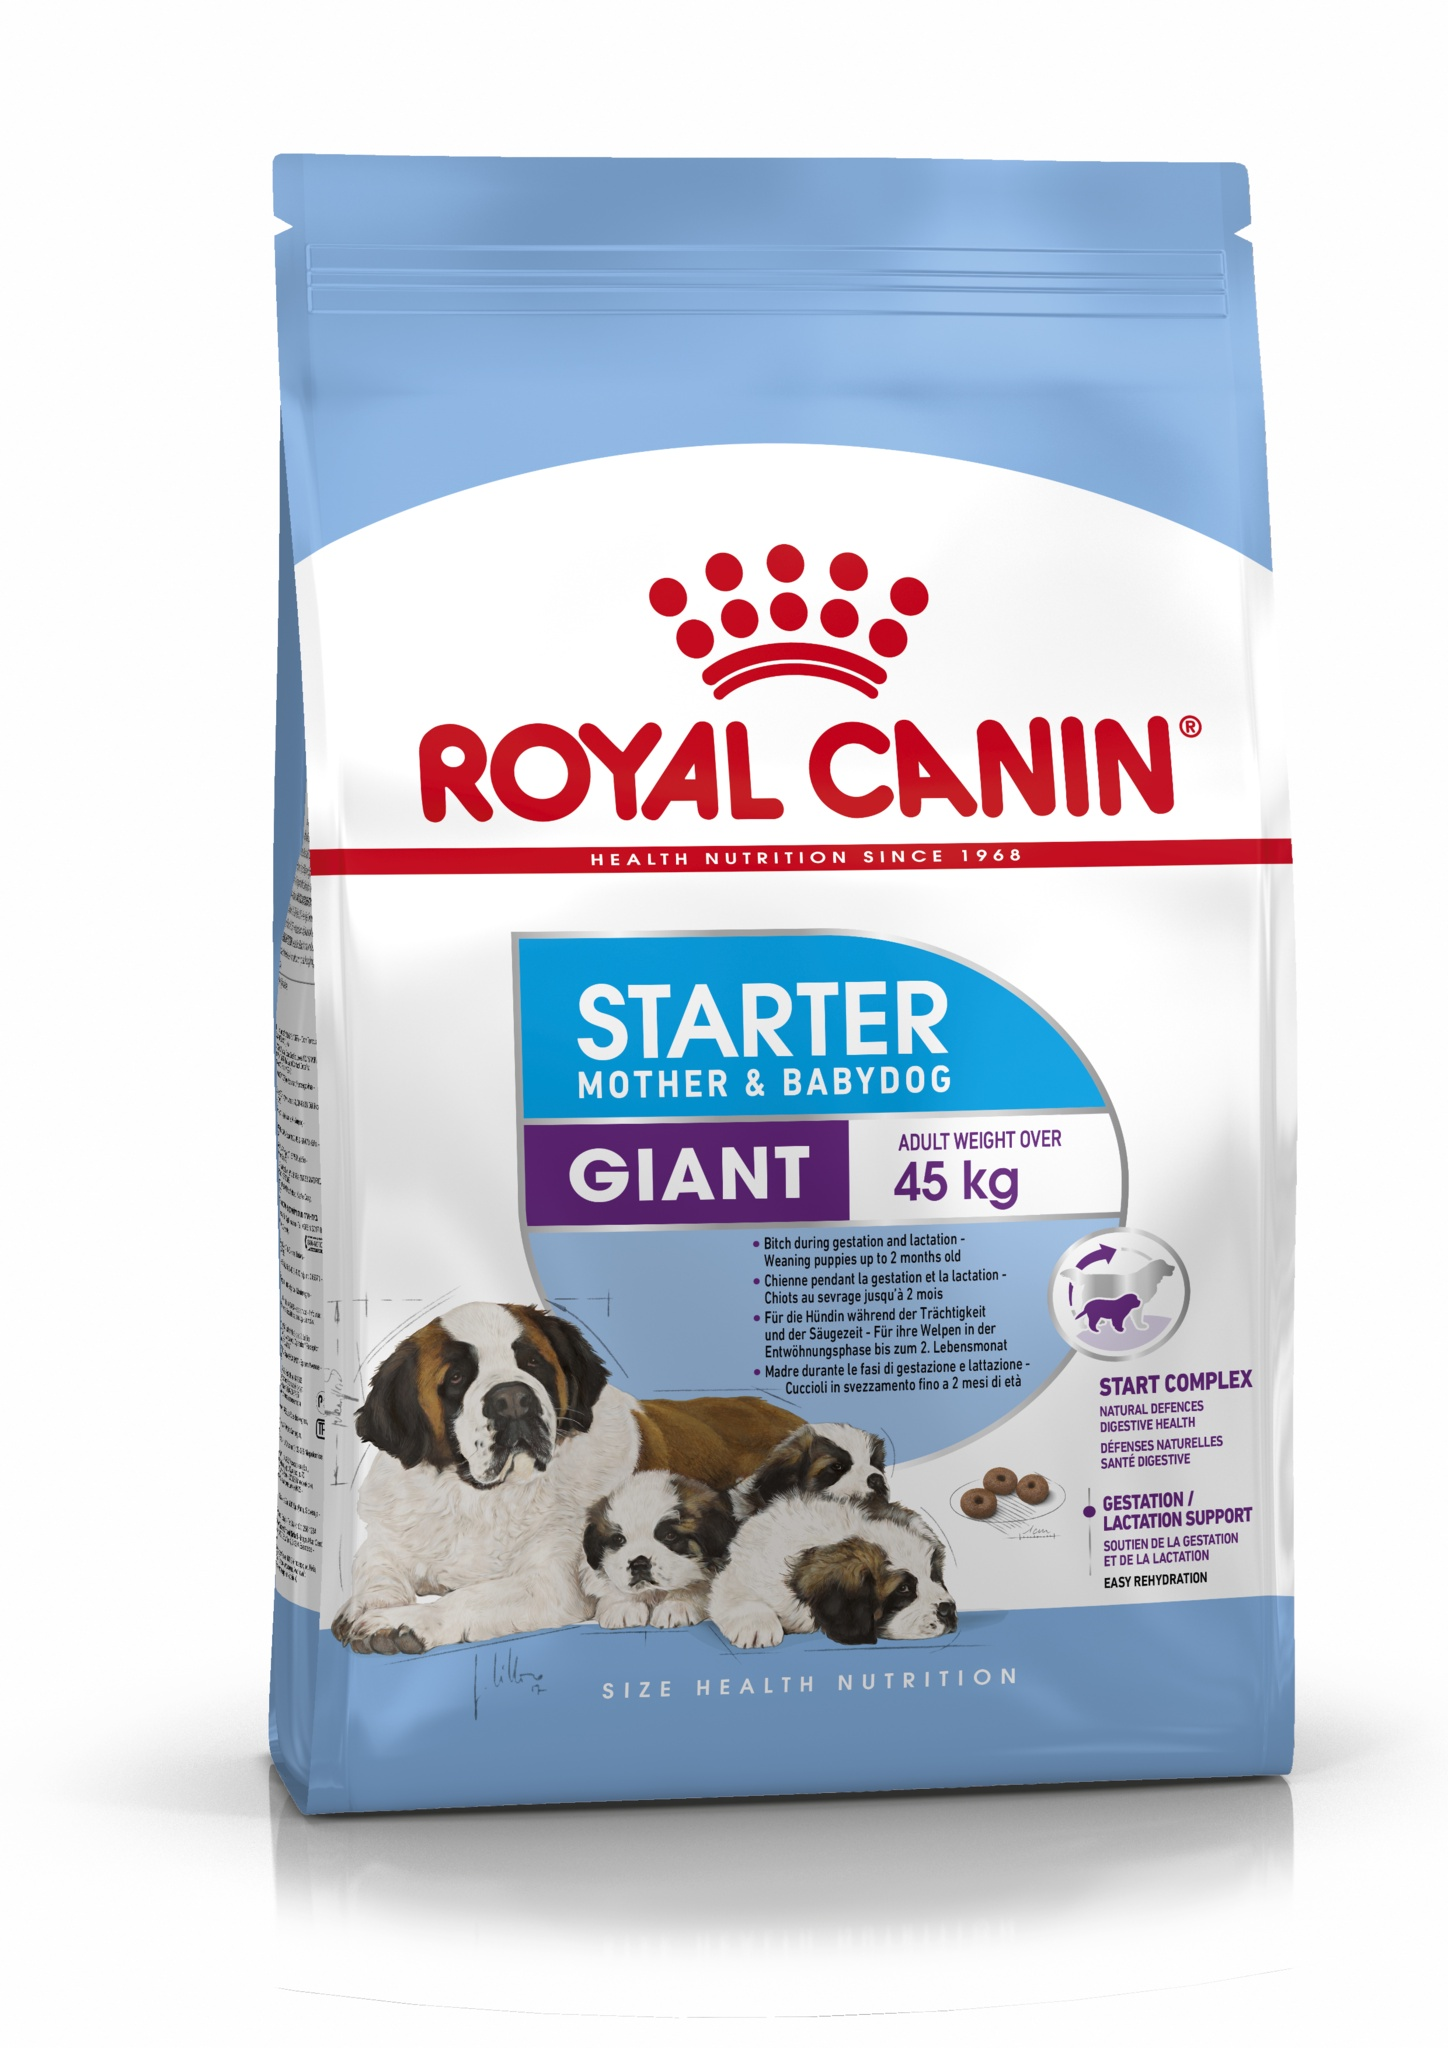 Royal Canin корм для щенков крупных пород до 2-х месячного возраста (15 кг) цена и фото